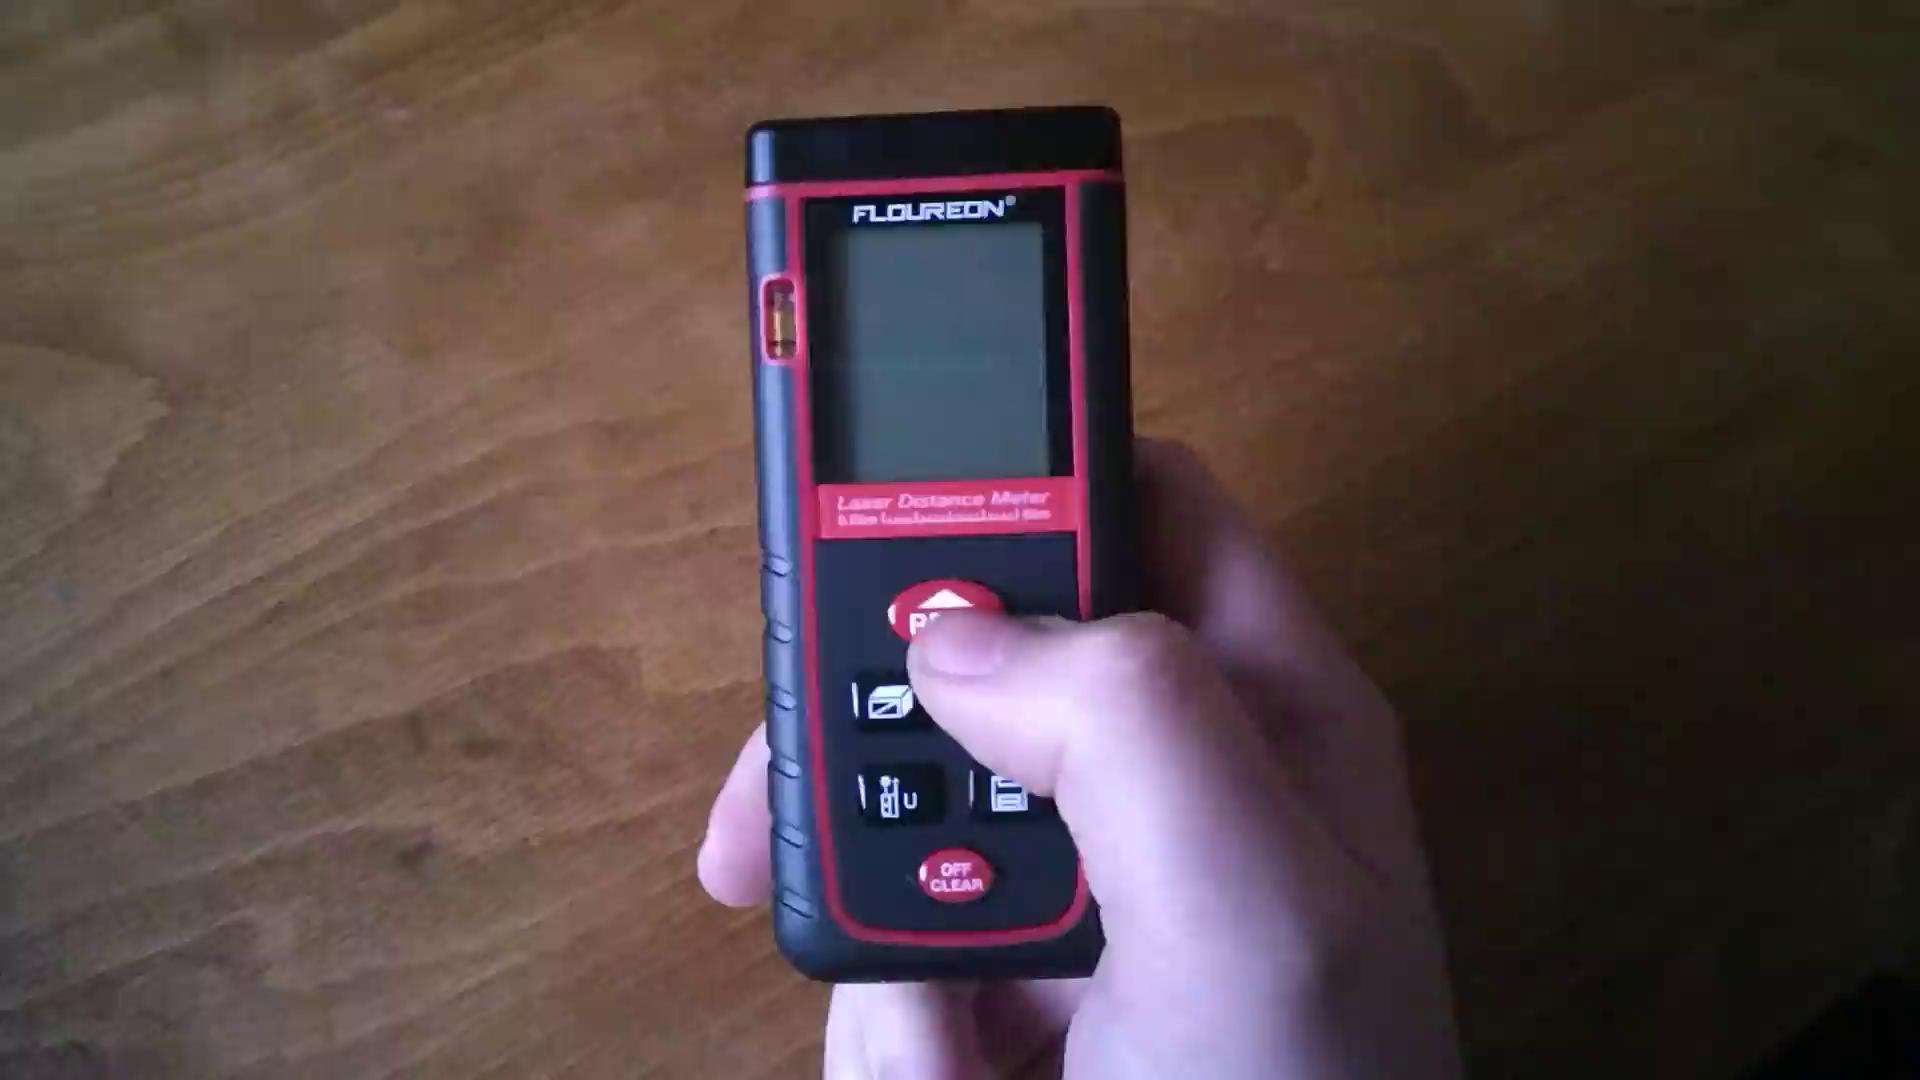 Makita Entfernungsmesser Rätsel : Amazon kundenrezensionen floureon laser entfernungsmesser